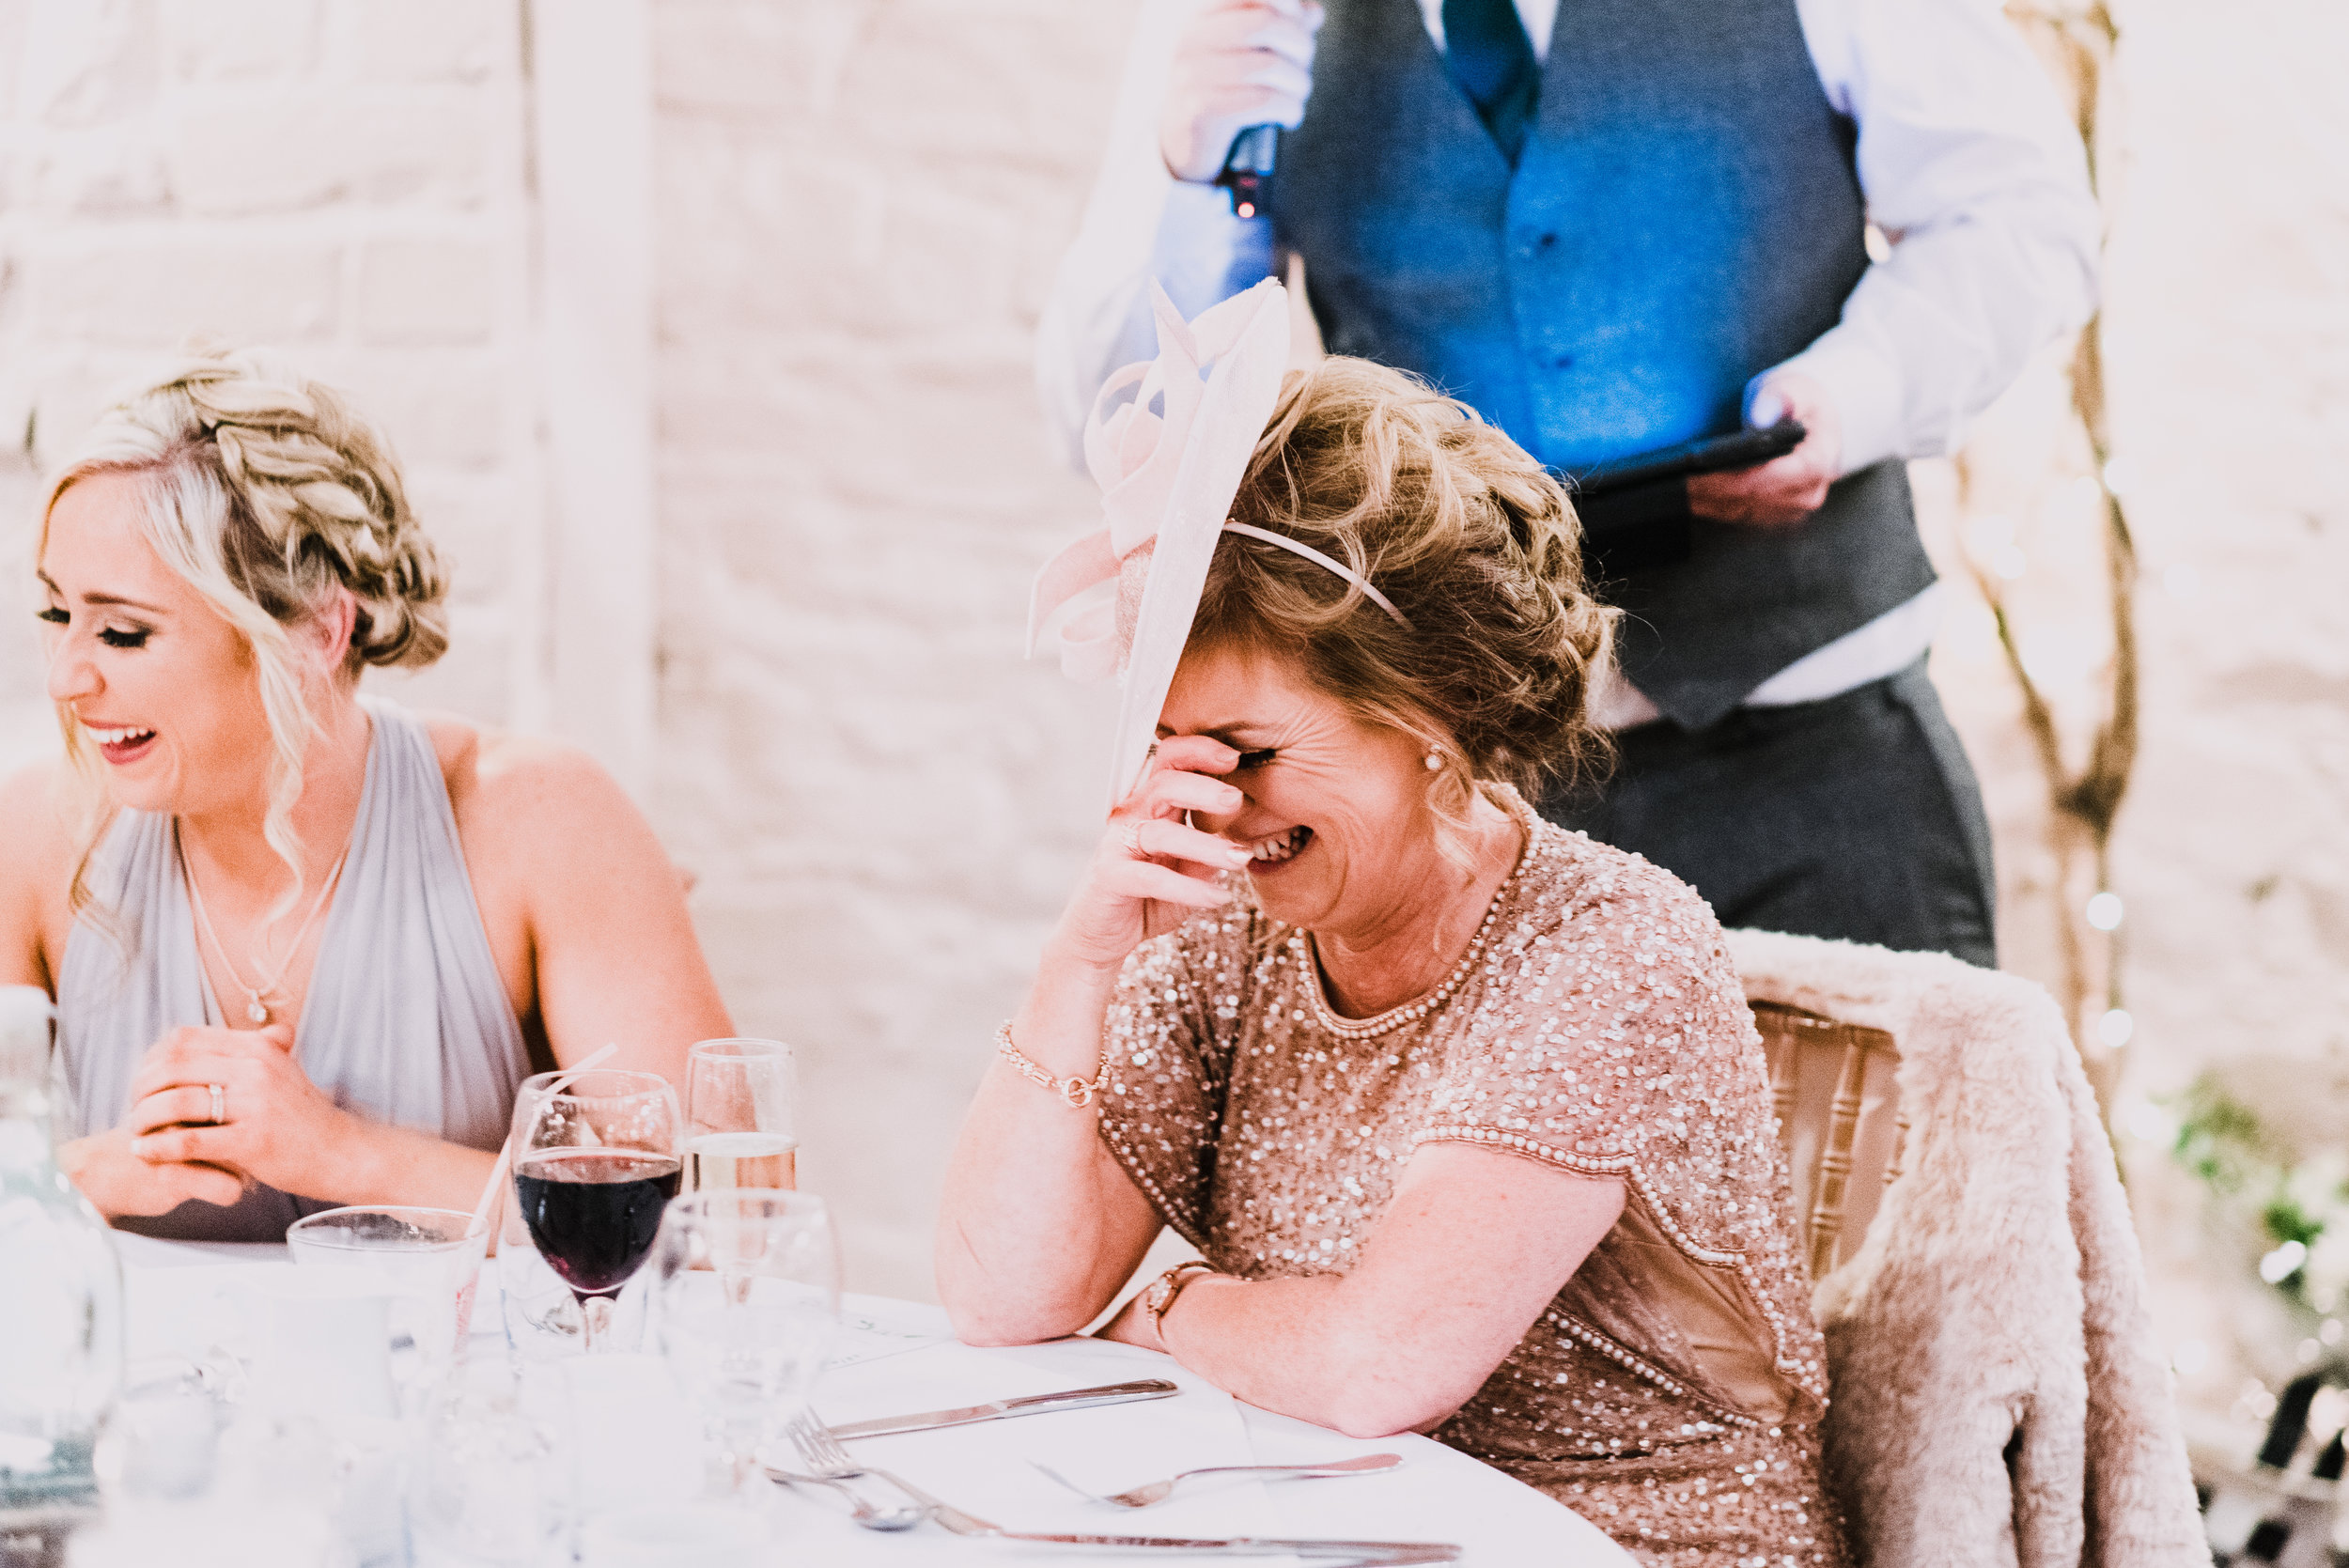 larchfield estate wedding, wedding venues northern ireland, barn wedding venues northern ireland, wedding photos larchfield estate, shane todd wedding, larchfield wedding decor ideas (20).jpg